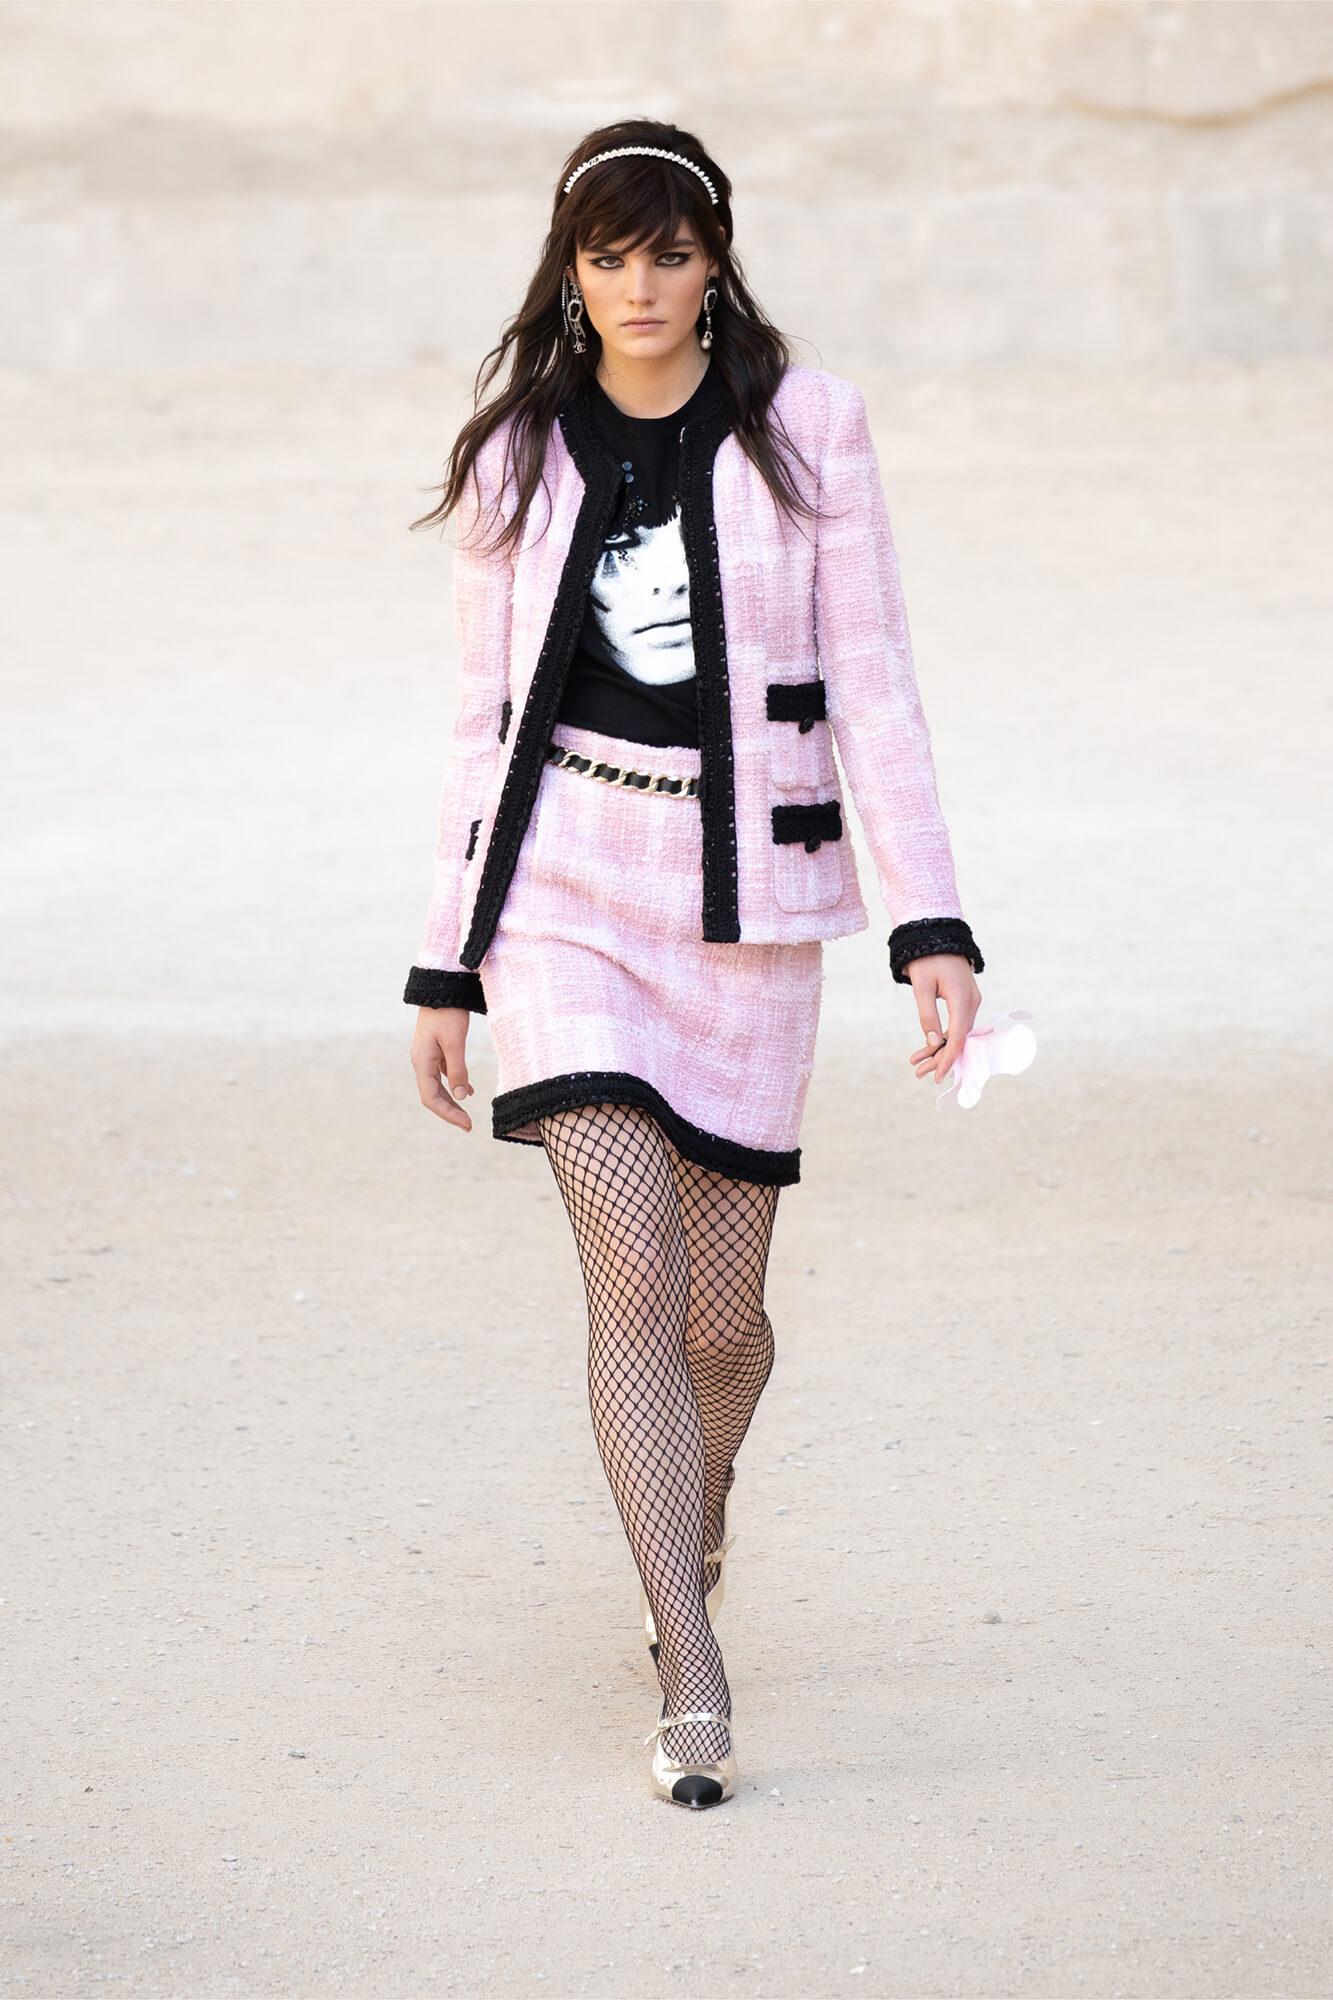 Chanel Cruise Collection 2021/22. Fotografía: Chanel